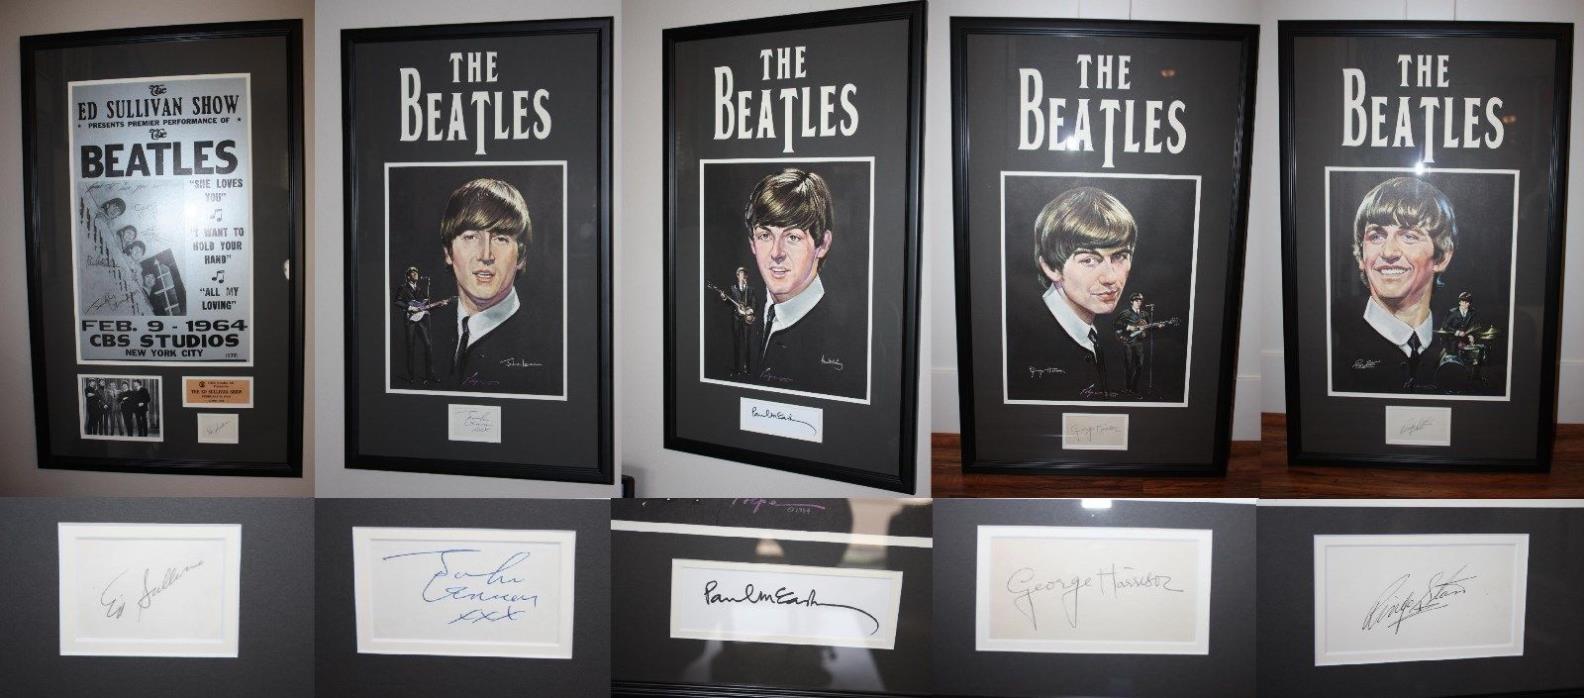 The Beatles Signed Fab Four John, Paul, George, Ringo & Ed Sullivan JSA Letter